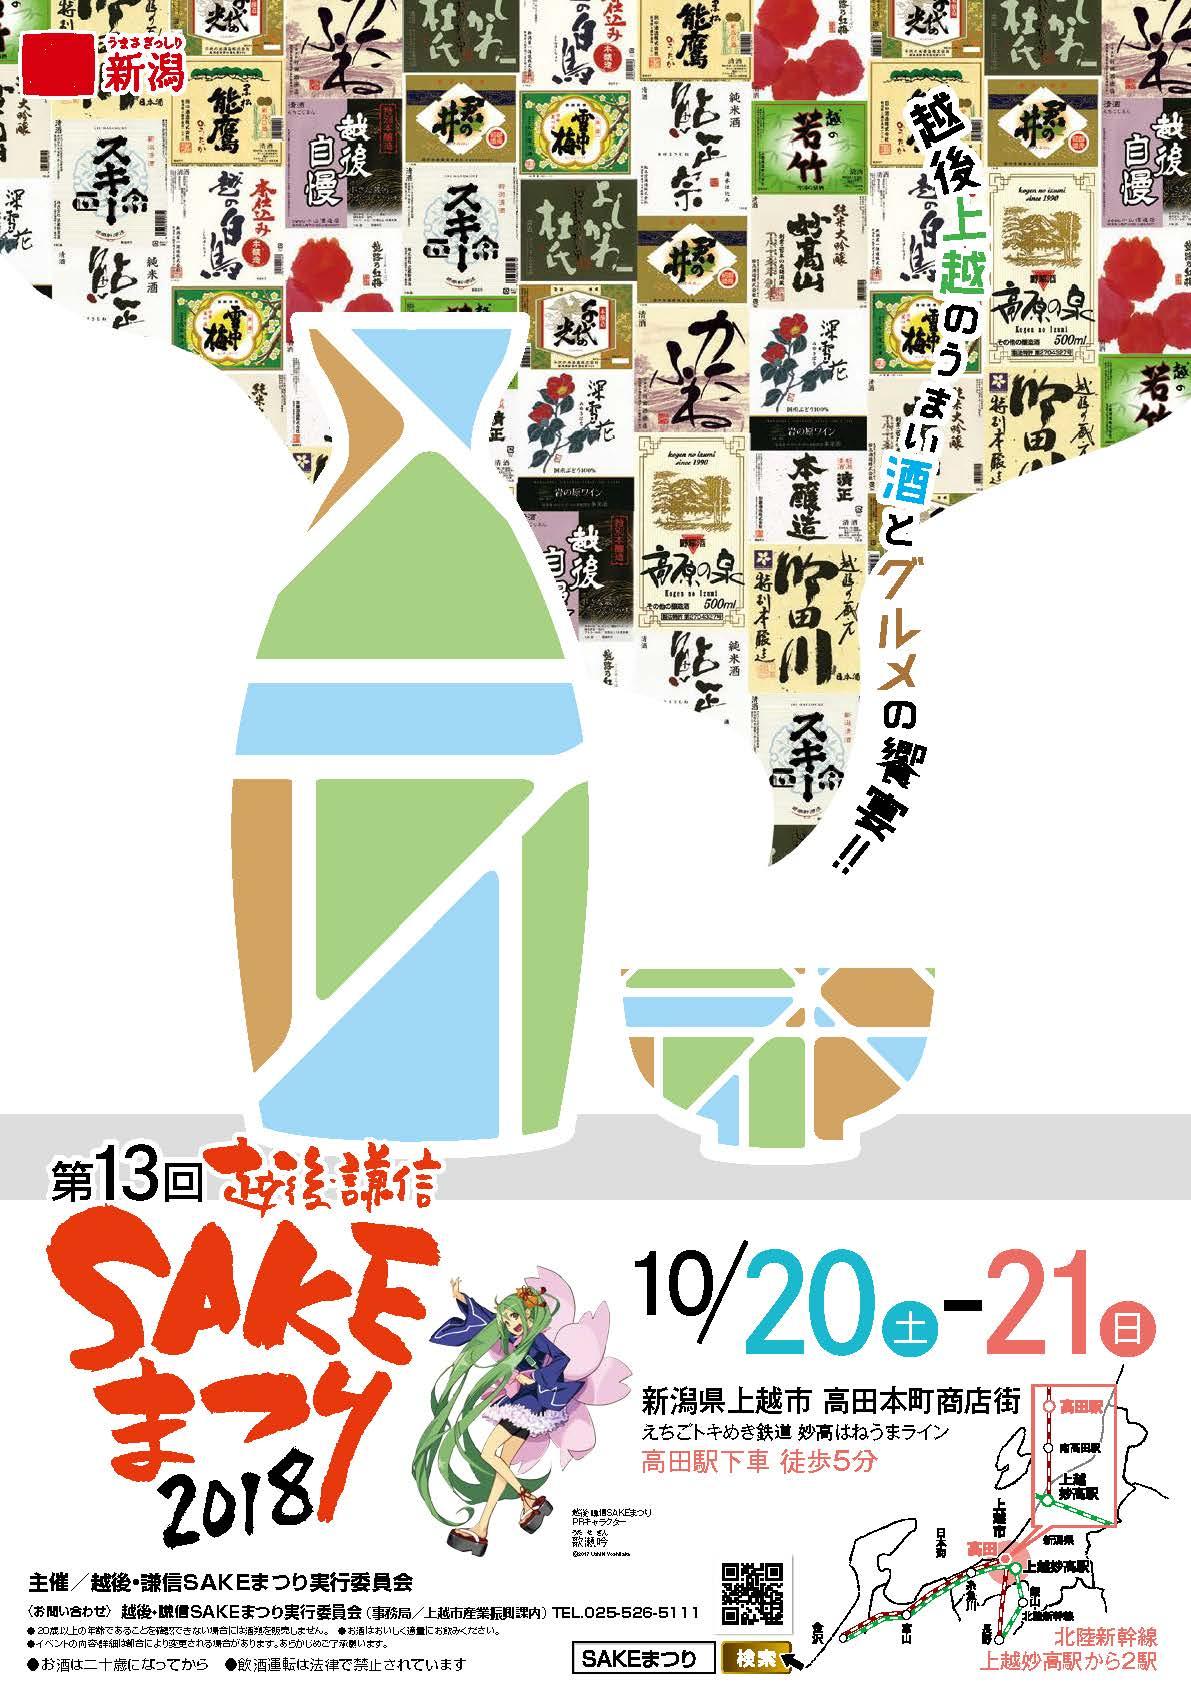 SAKEまつり 次年度チラシ-03